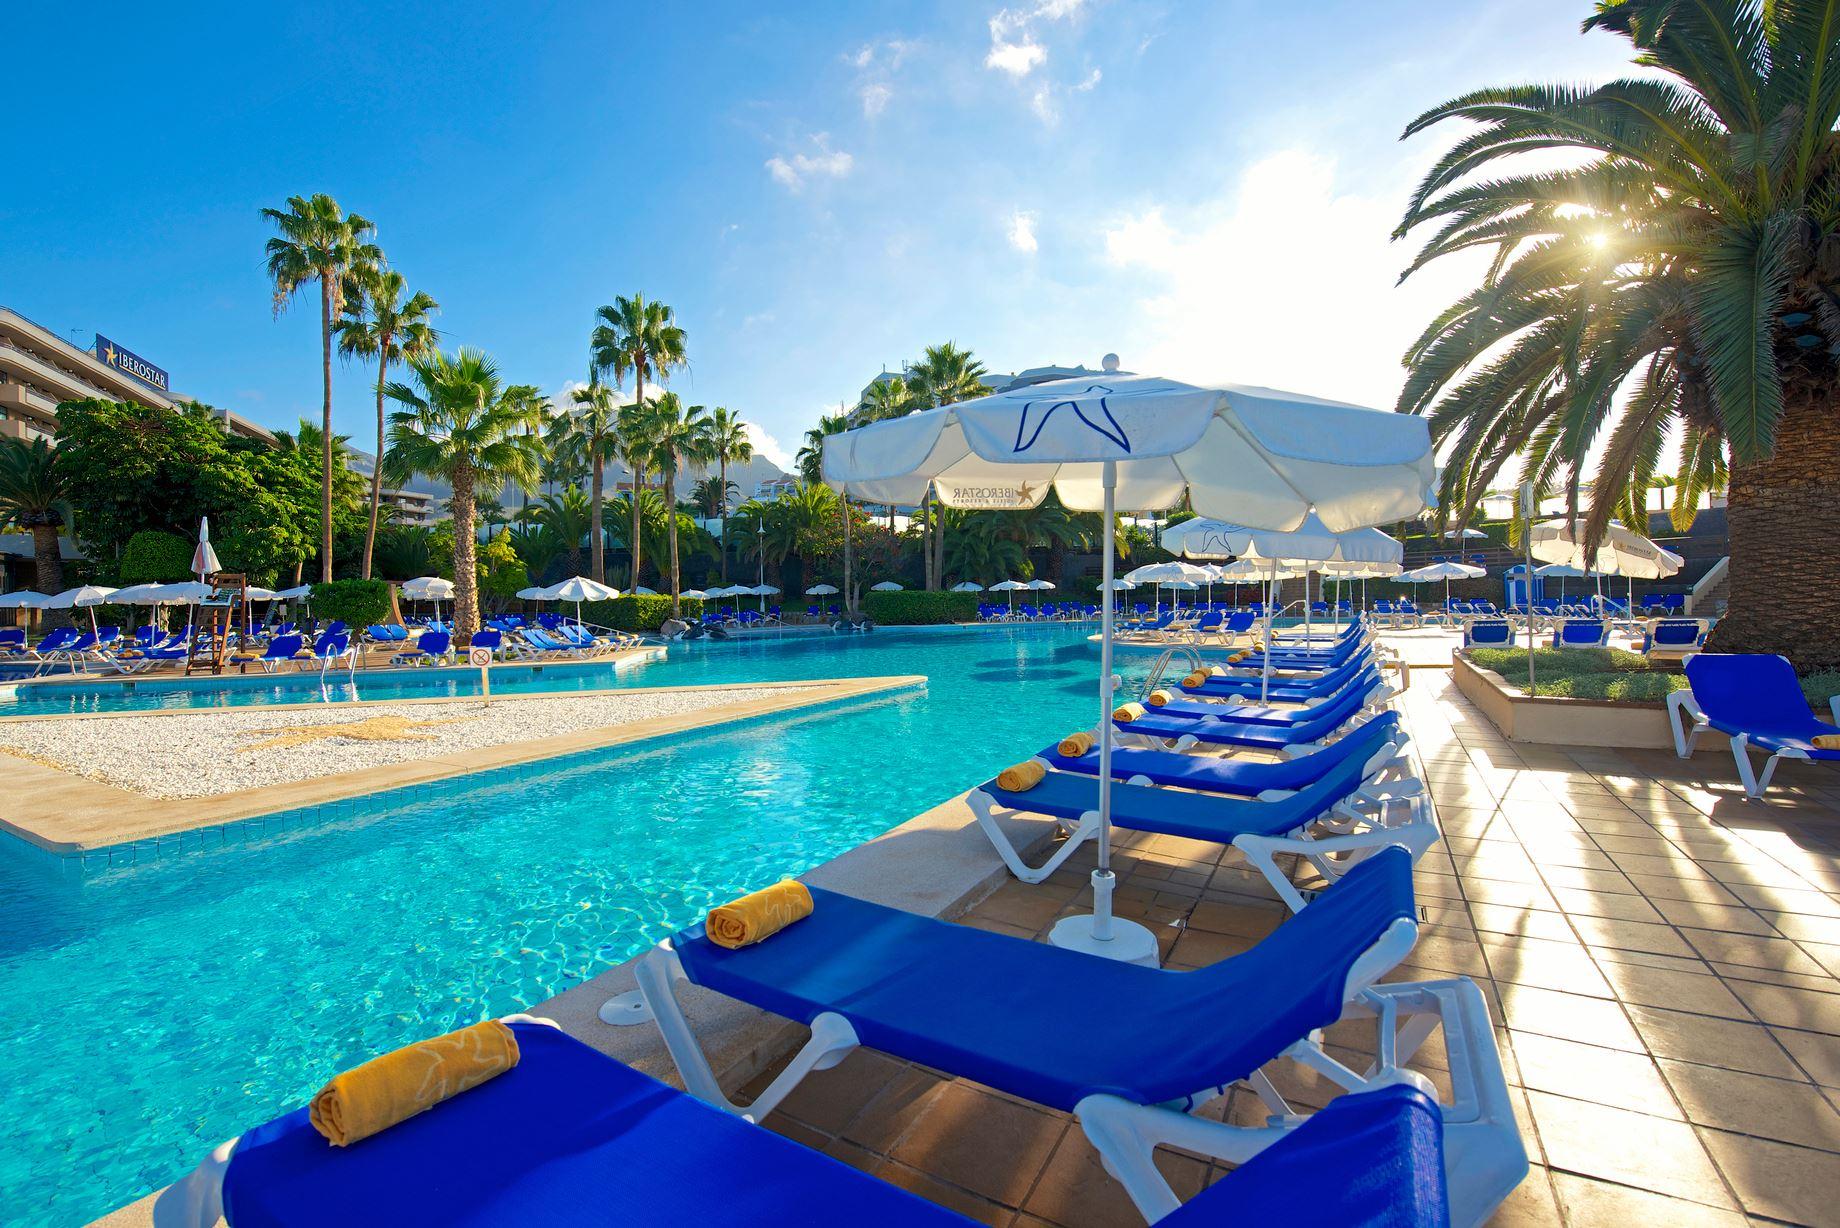 Pool, Iberostar Torviscas Playa, Adeje, Teneriffa, Signaturresor